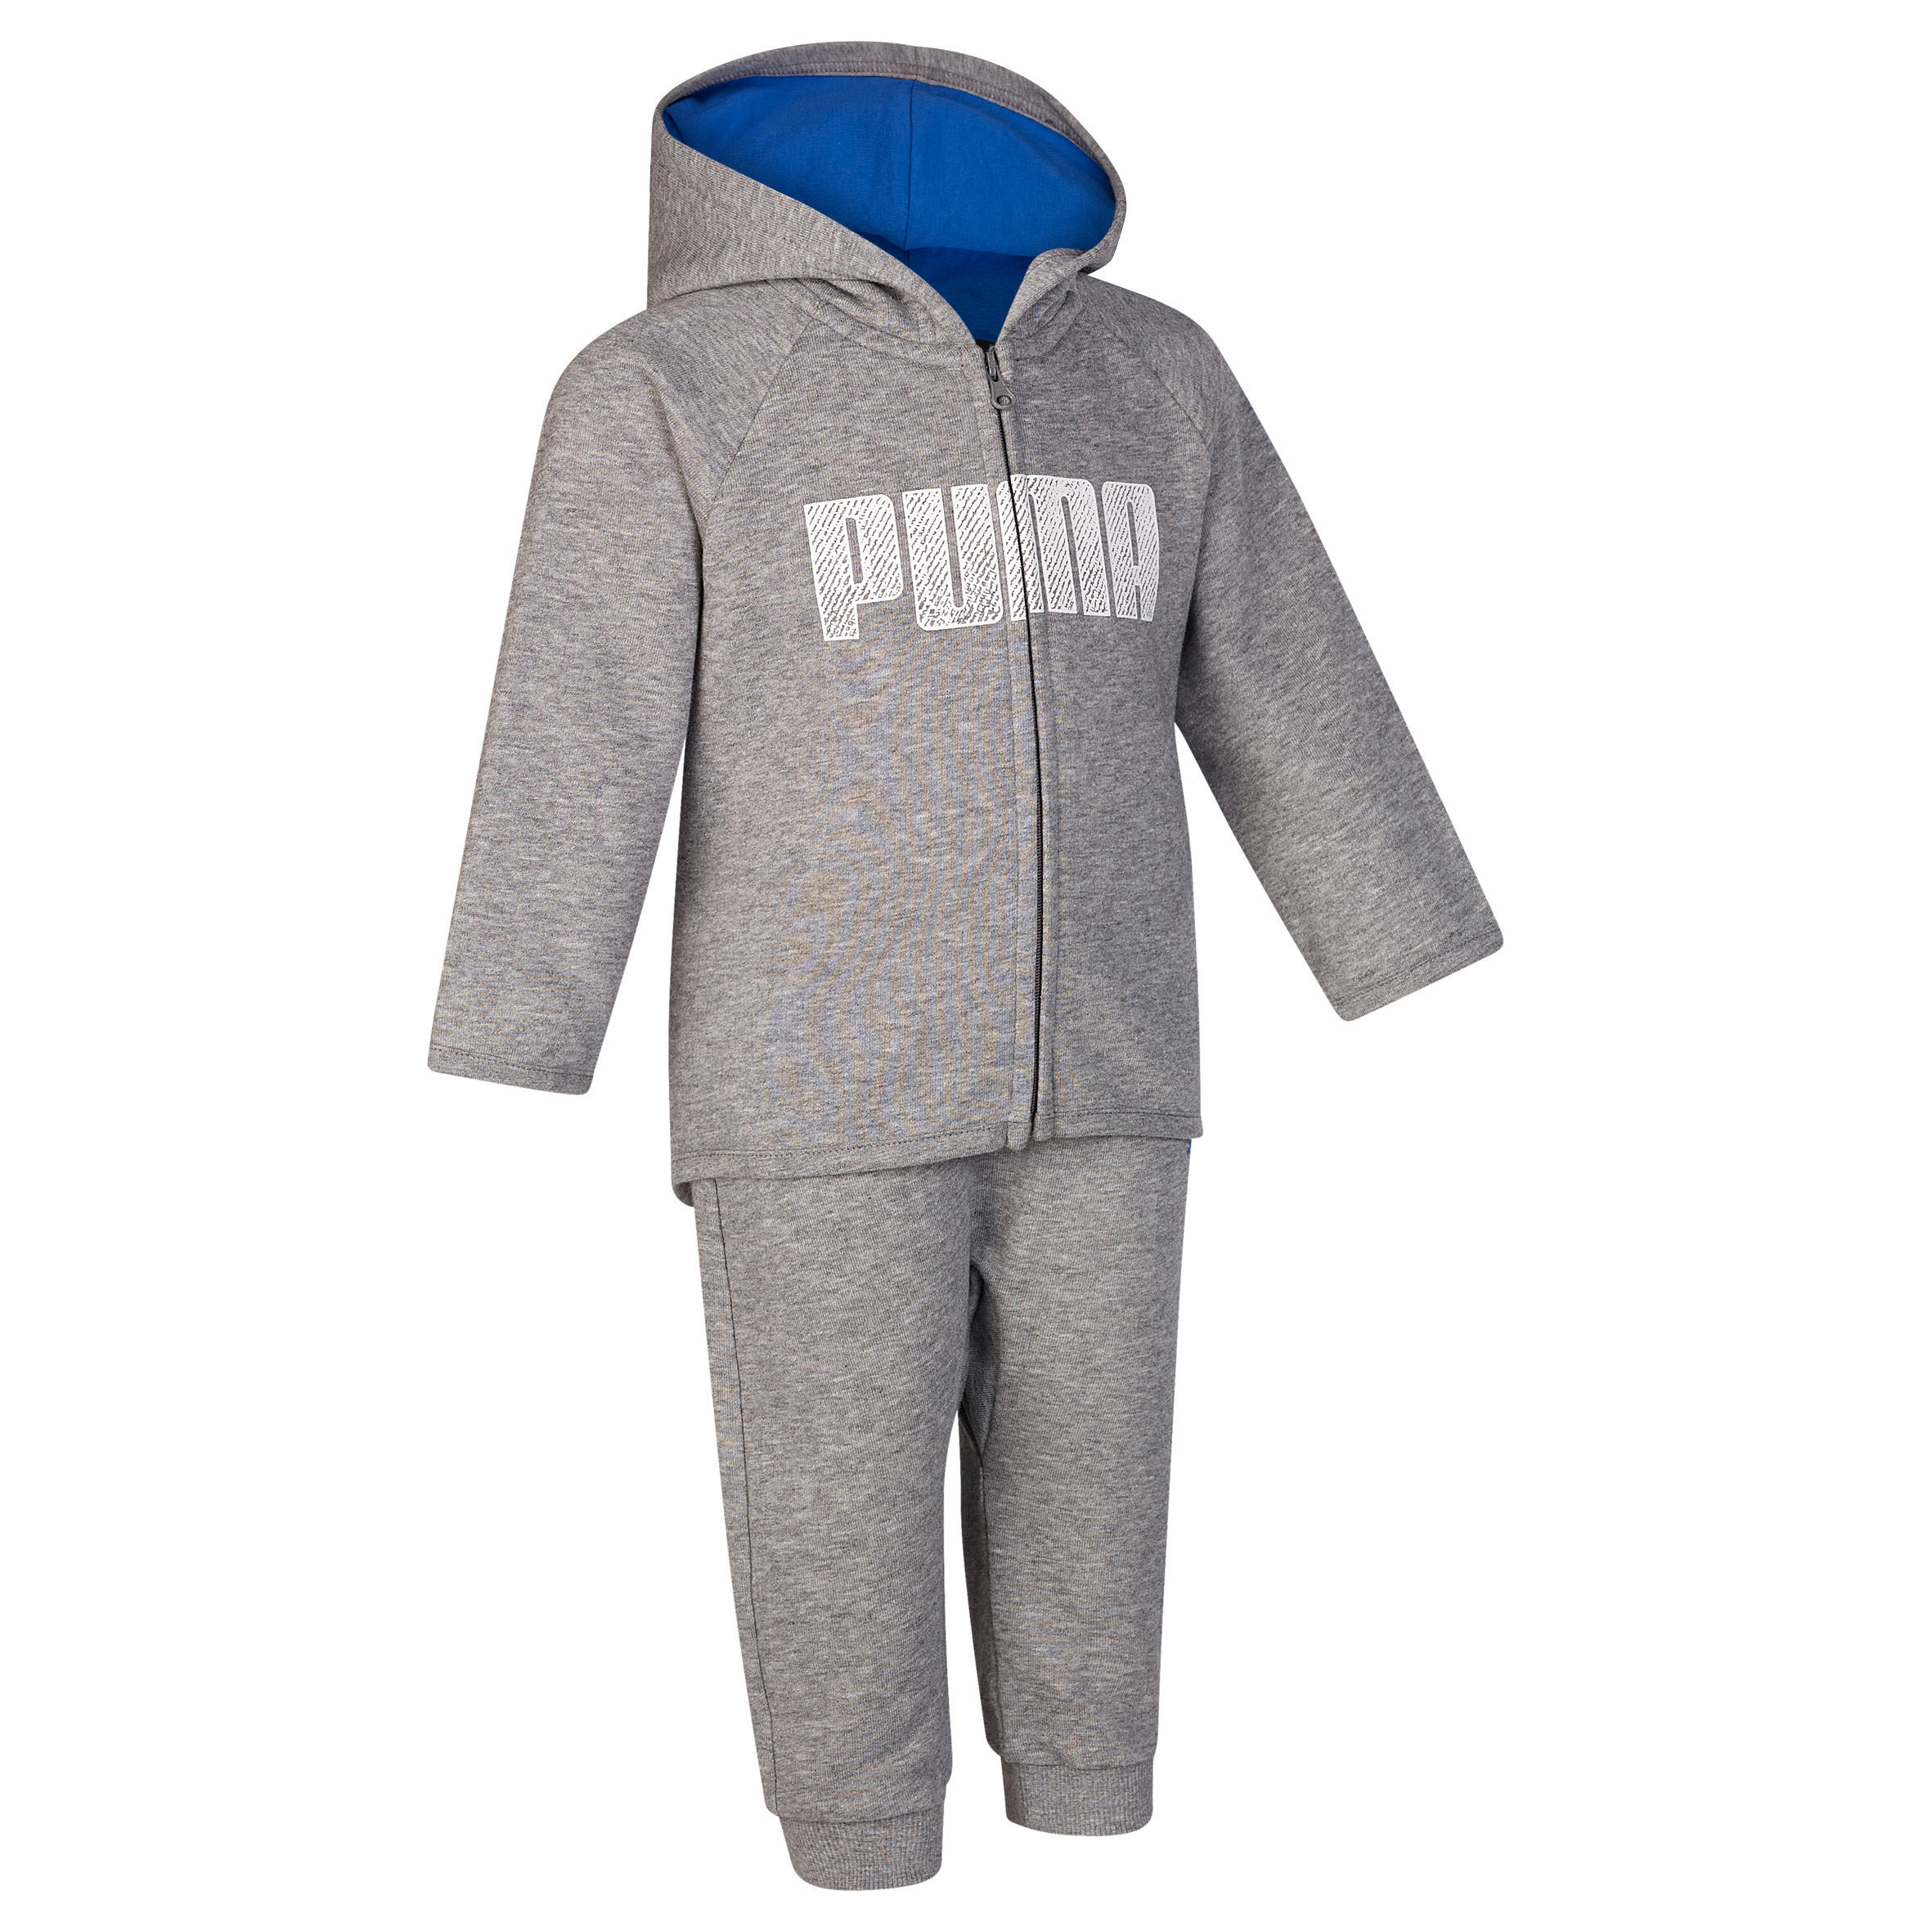 Puma Trainingspak voor kleutergym grijs blauw